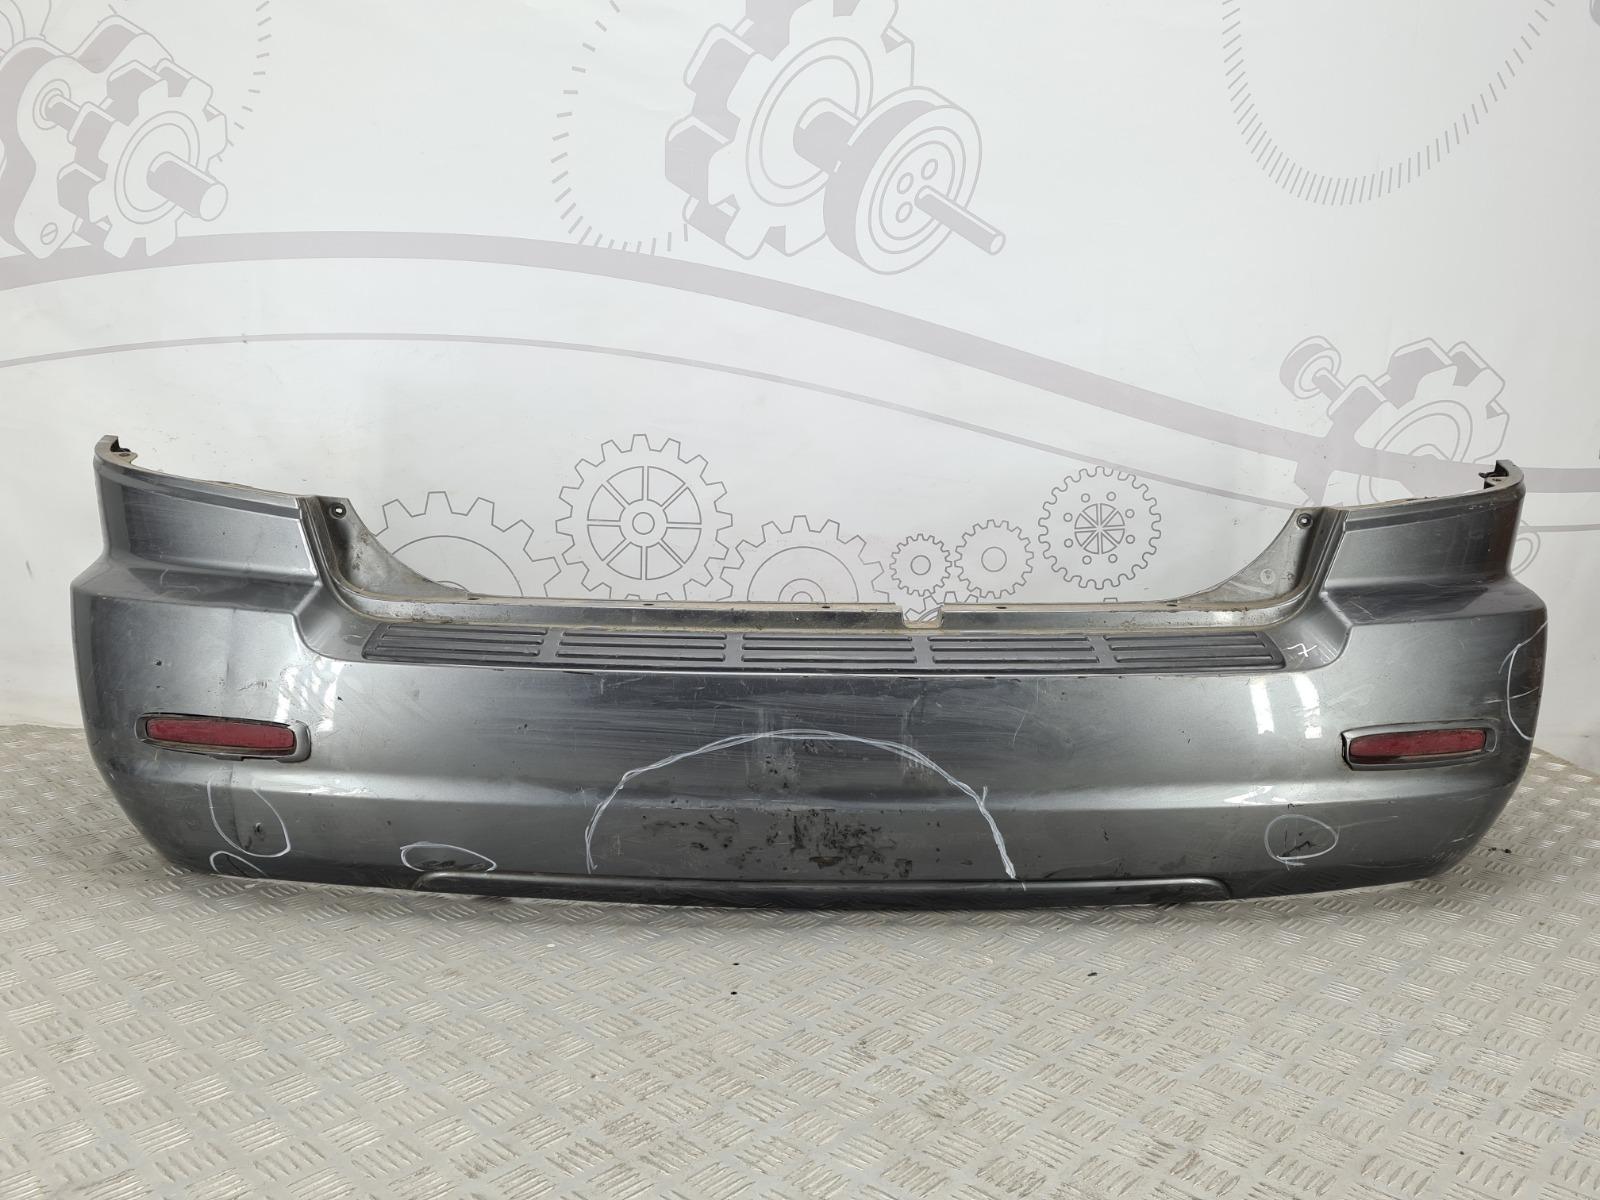 Бампер задний Kia Sorento 2.5 CRD 2006 (б/у)